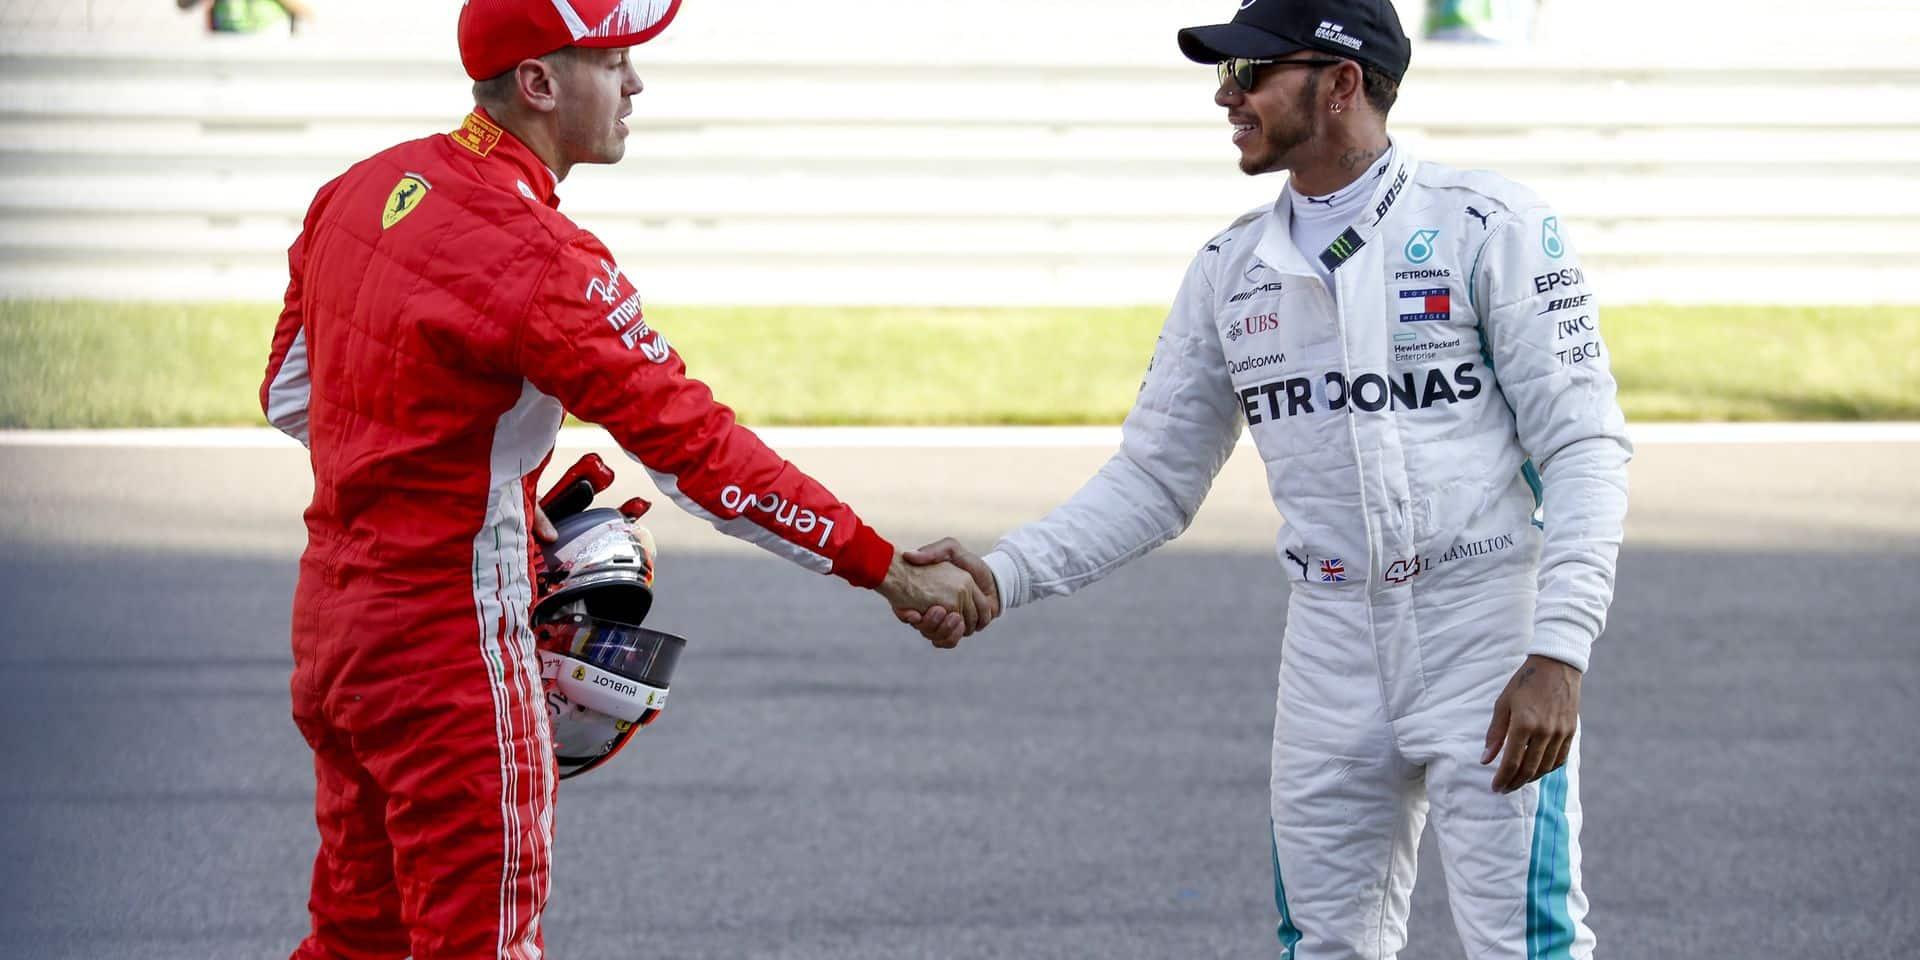 Motorsports: FIA Formula One World Championship 2018, Grand Prix of Russia